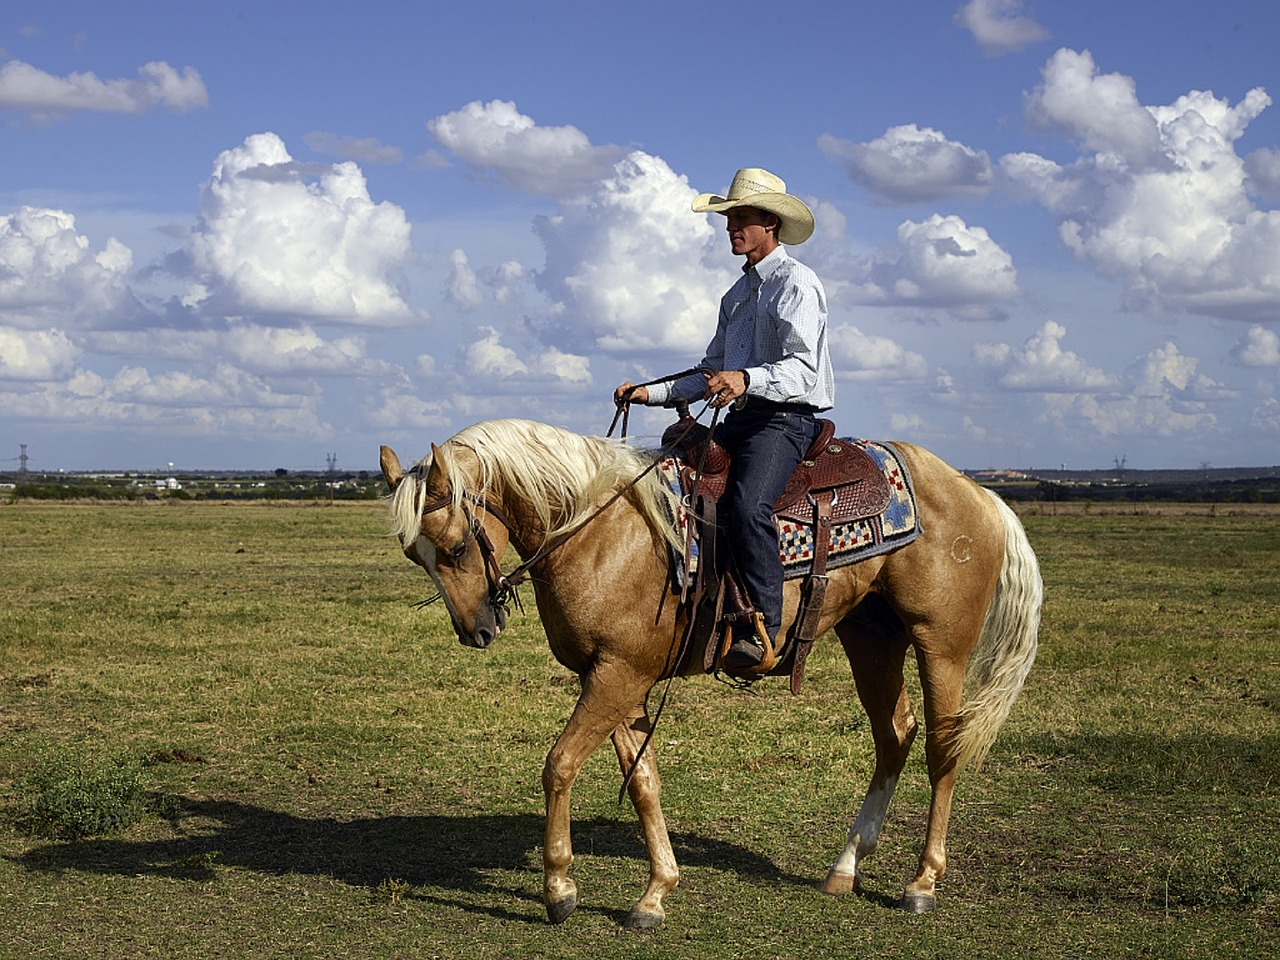 cowboy-746992_1280